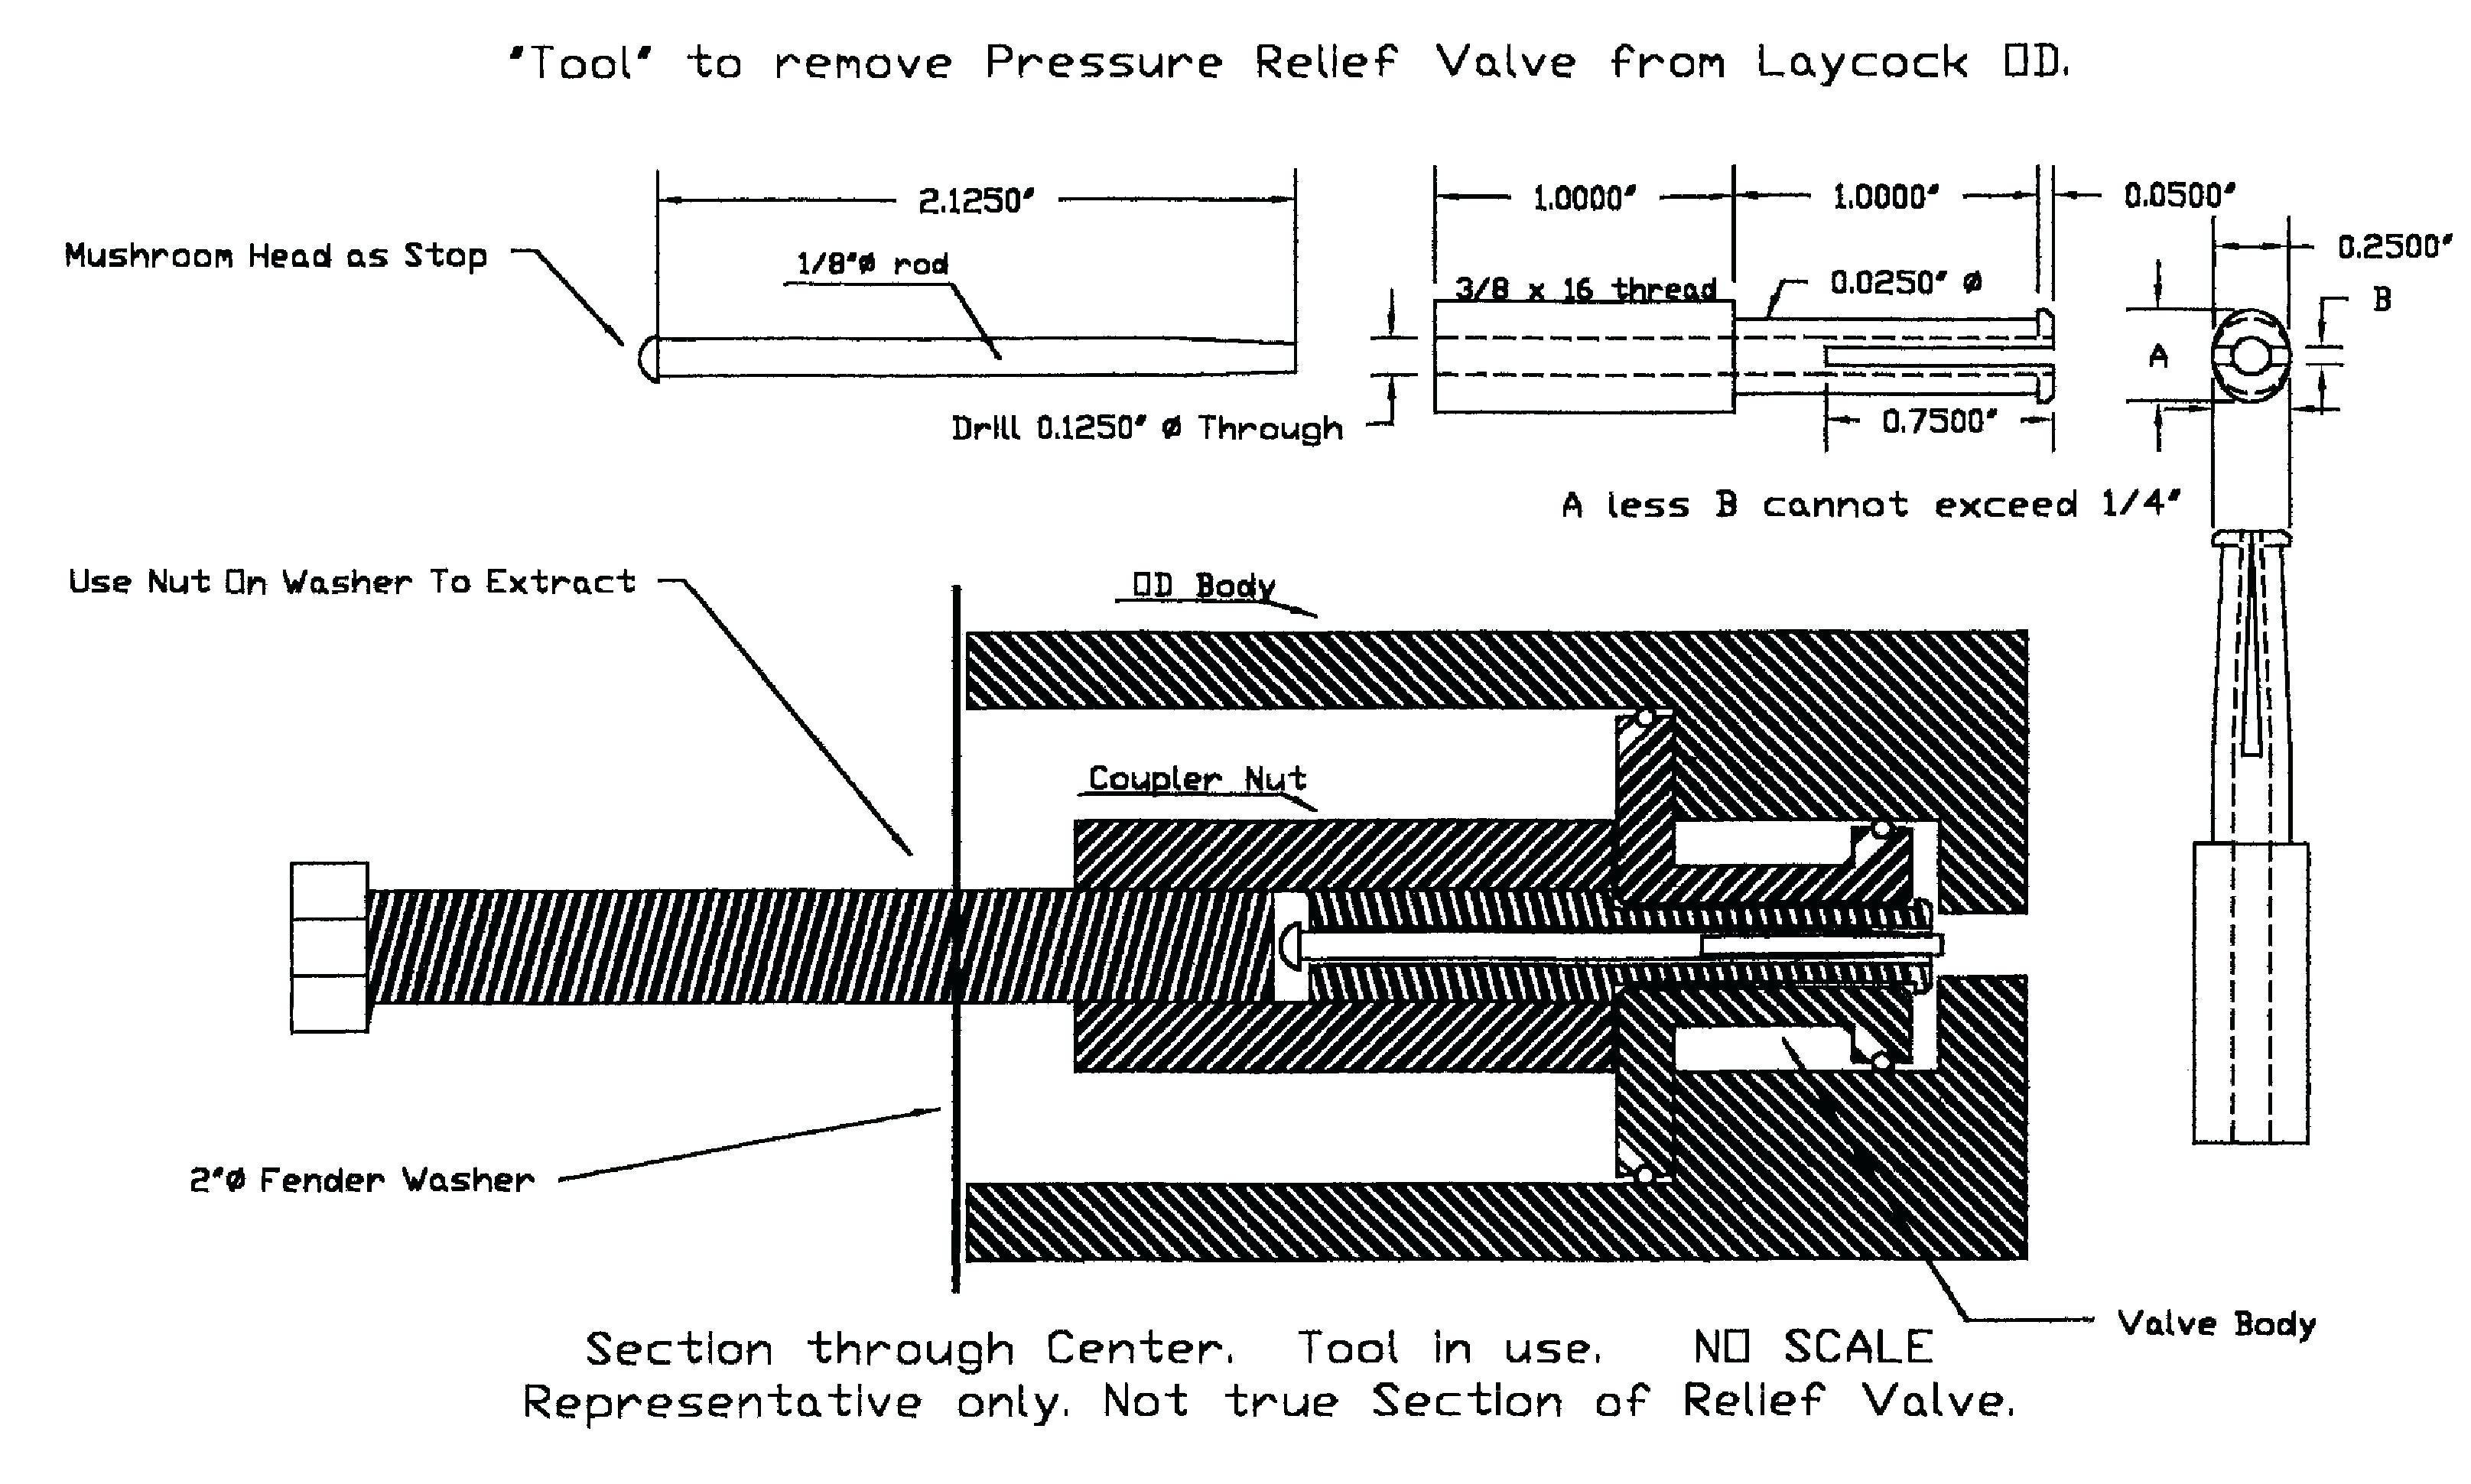 2004 subaru forester car radio stereo wiring diagram 1992 honda accord lx 2002 engine my